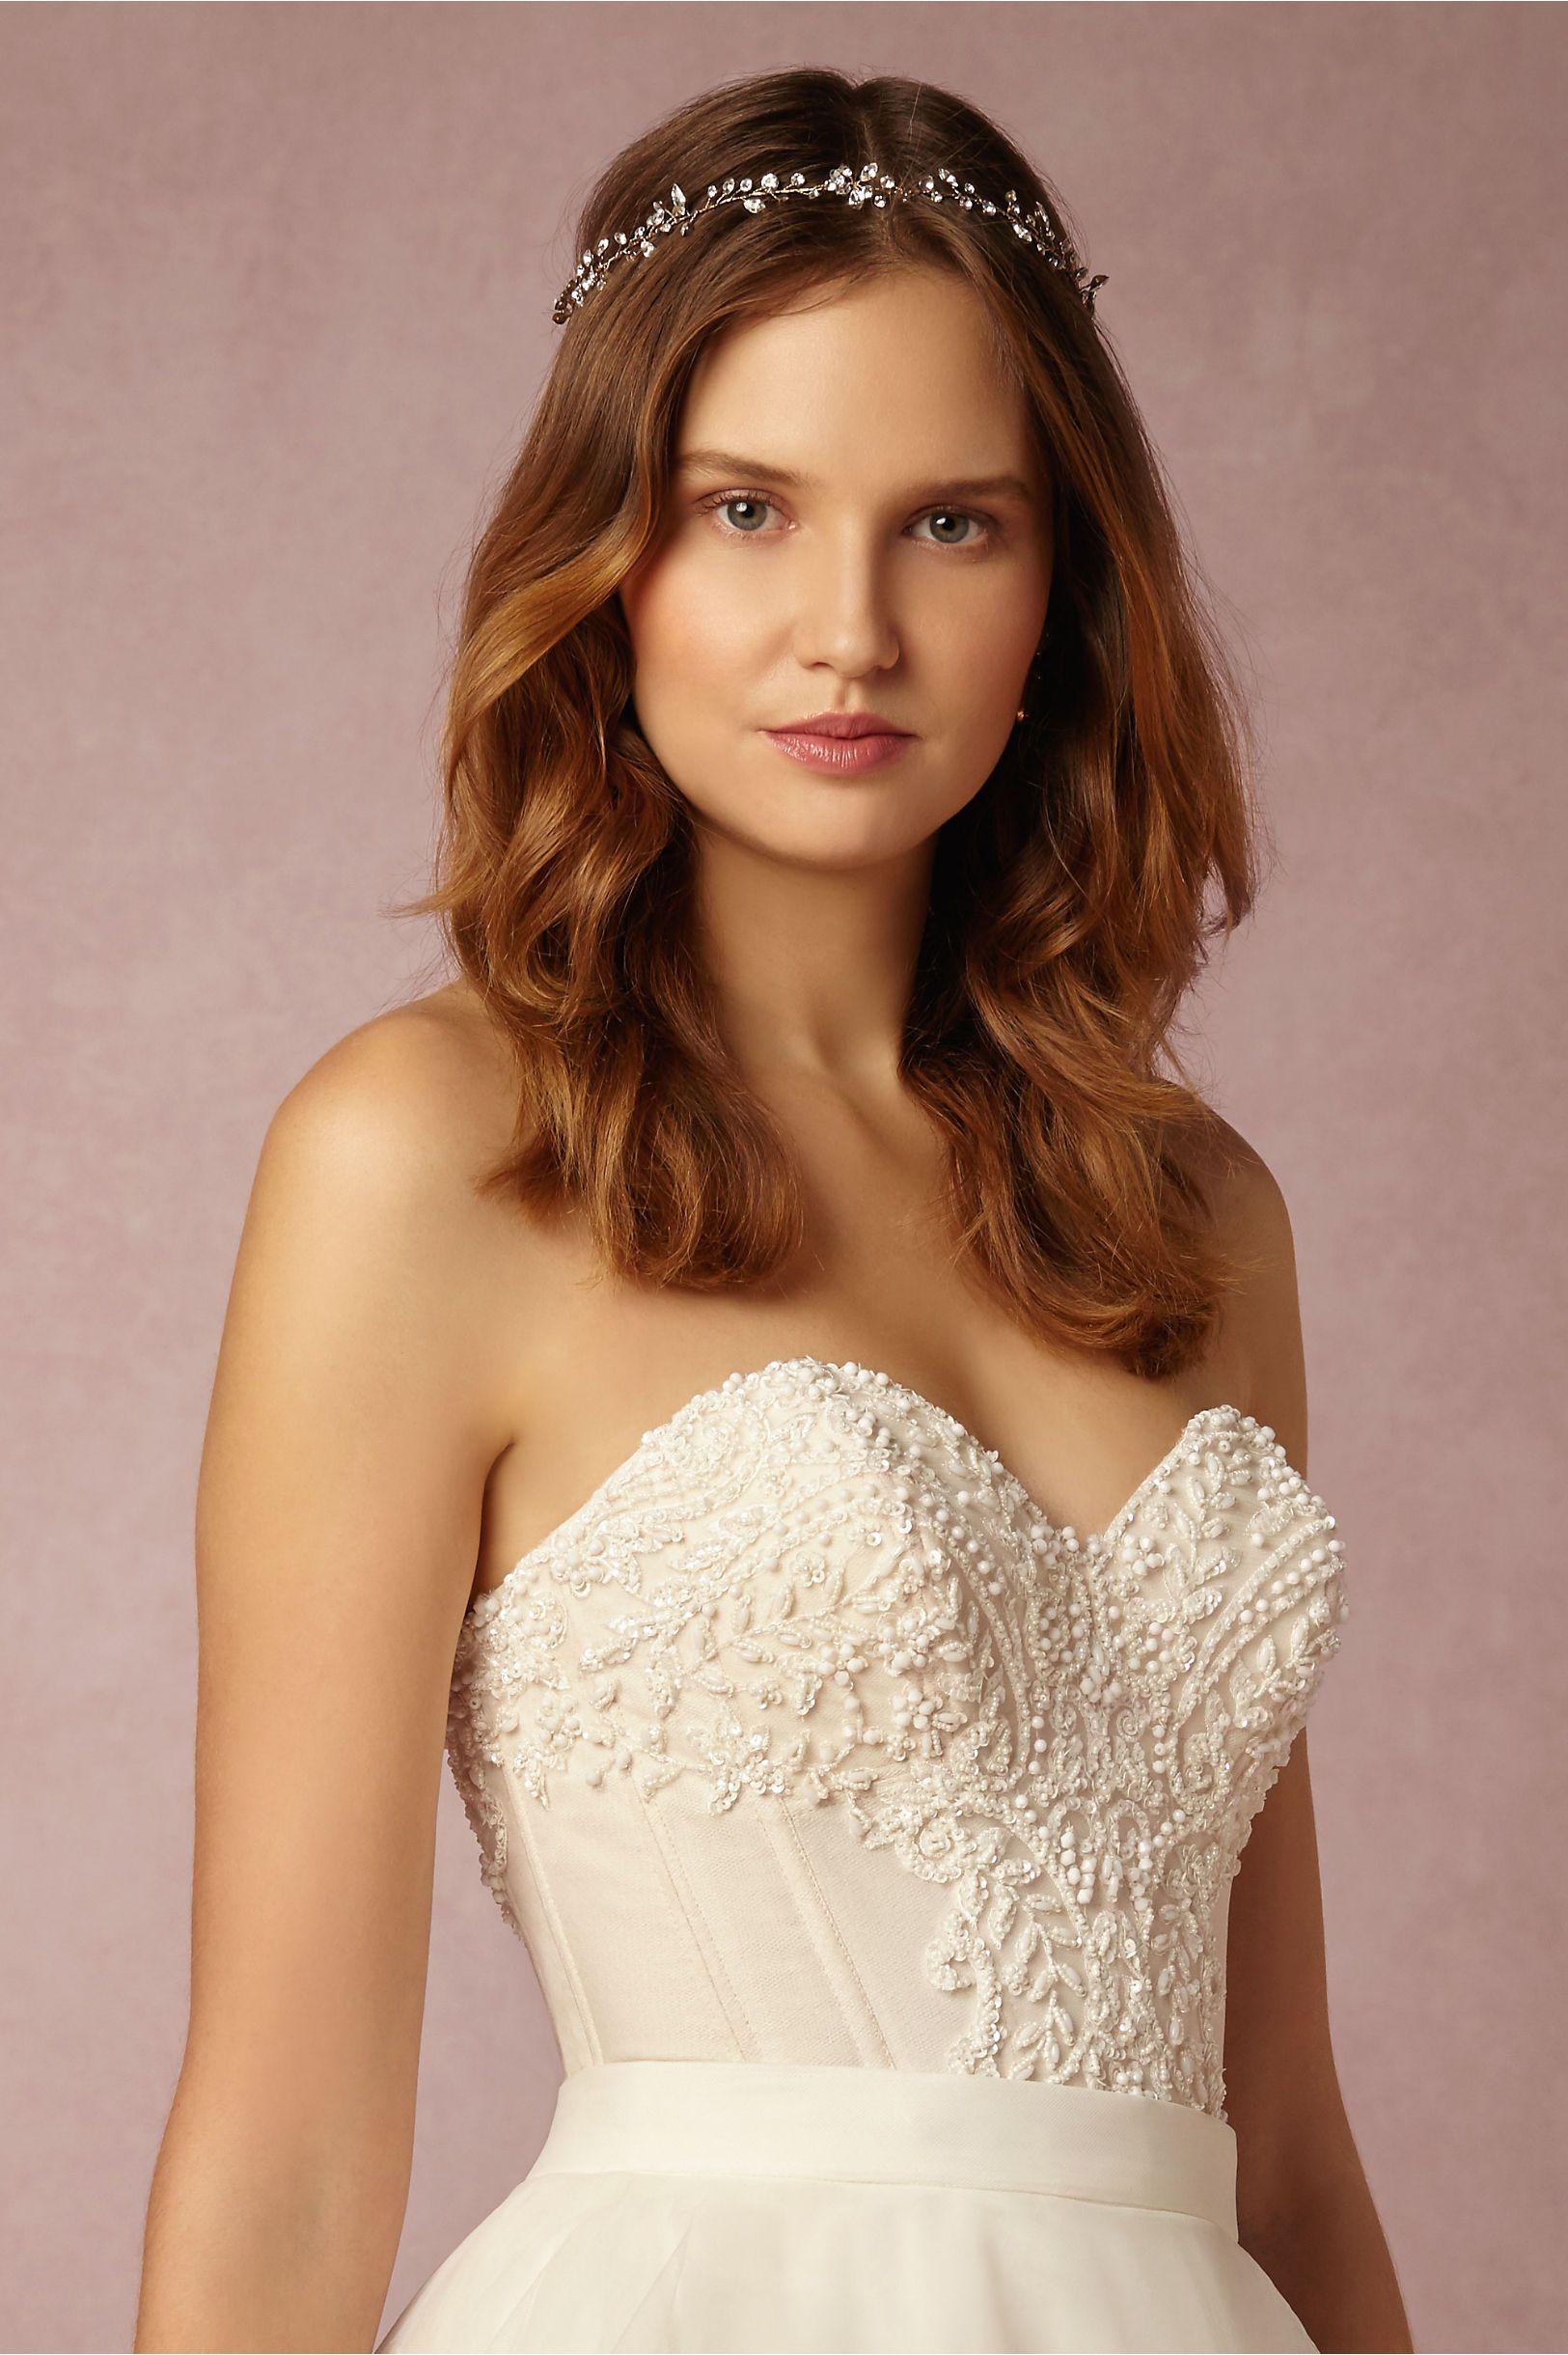 Bhldn Tisha Corset In Bride Bridal Separates Tops At